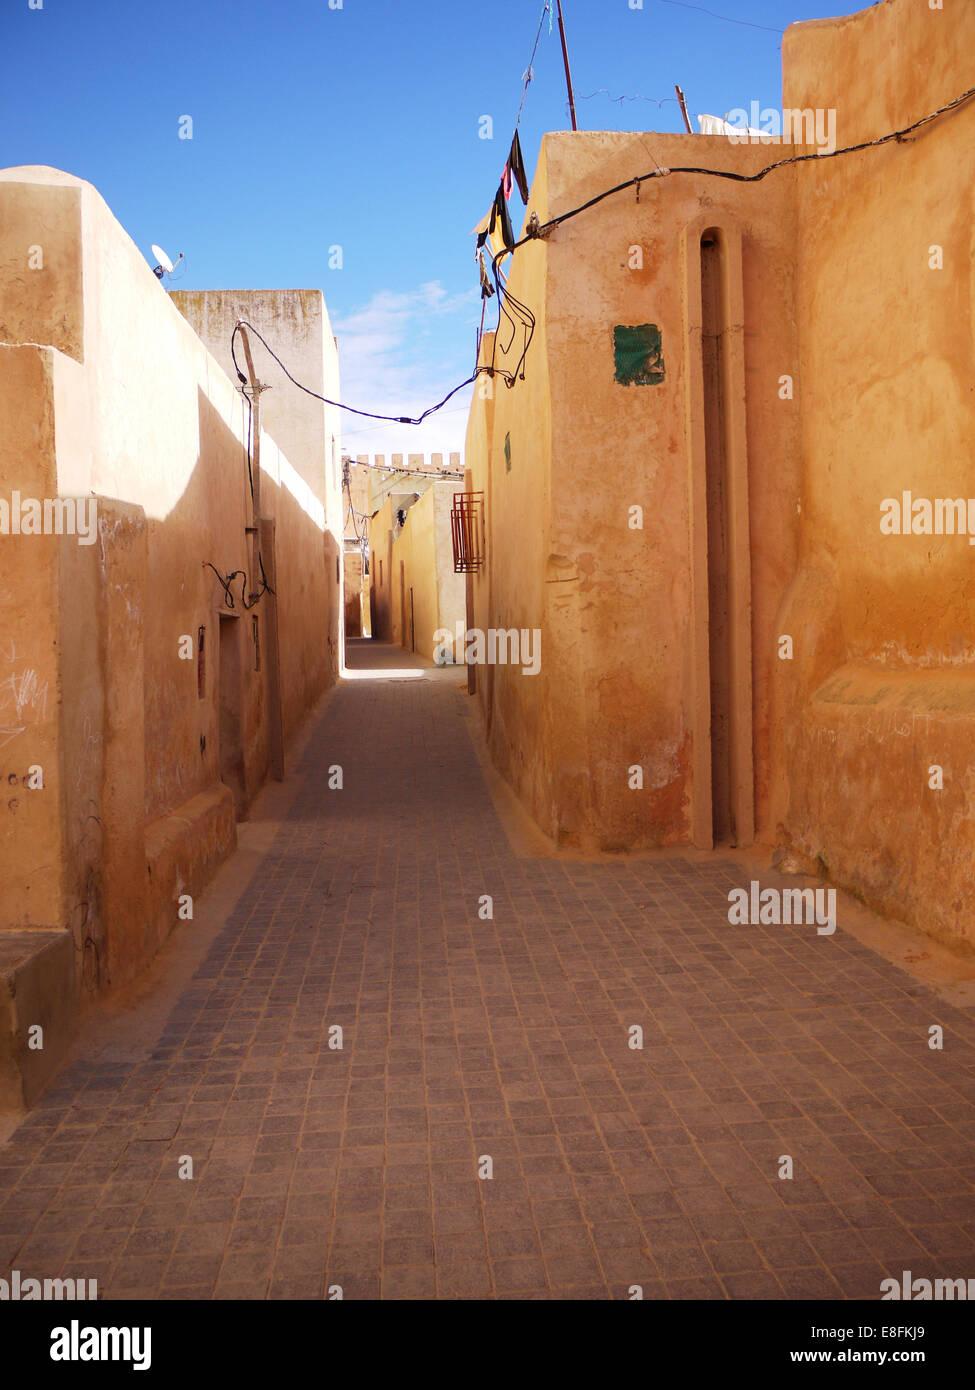 Empty alley between buildings, Morocco - Stock Image